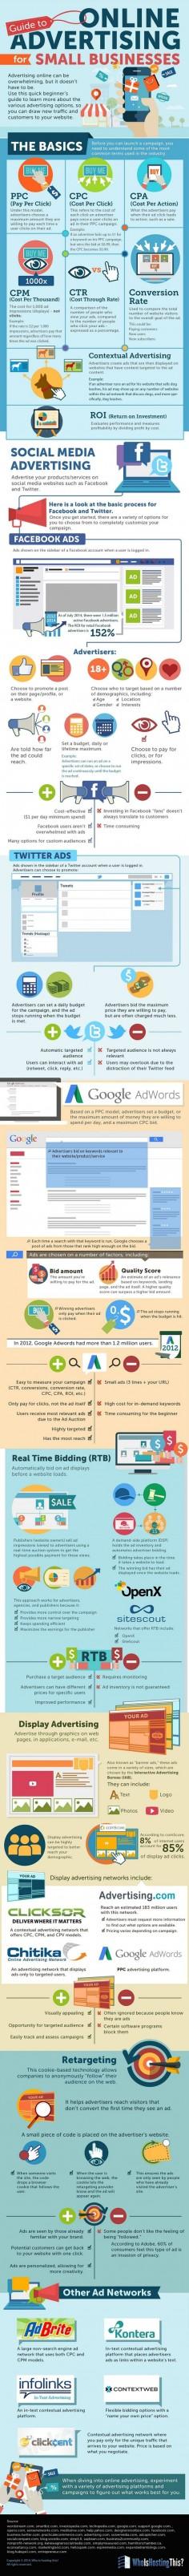 Guide To #InternetAdvertising For Small Businesses - #Socialmedia